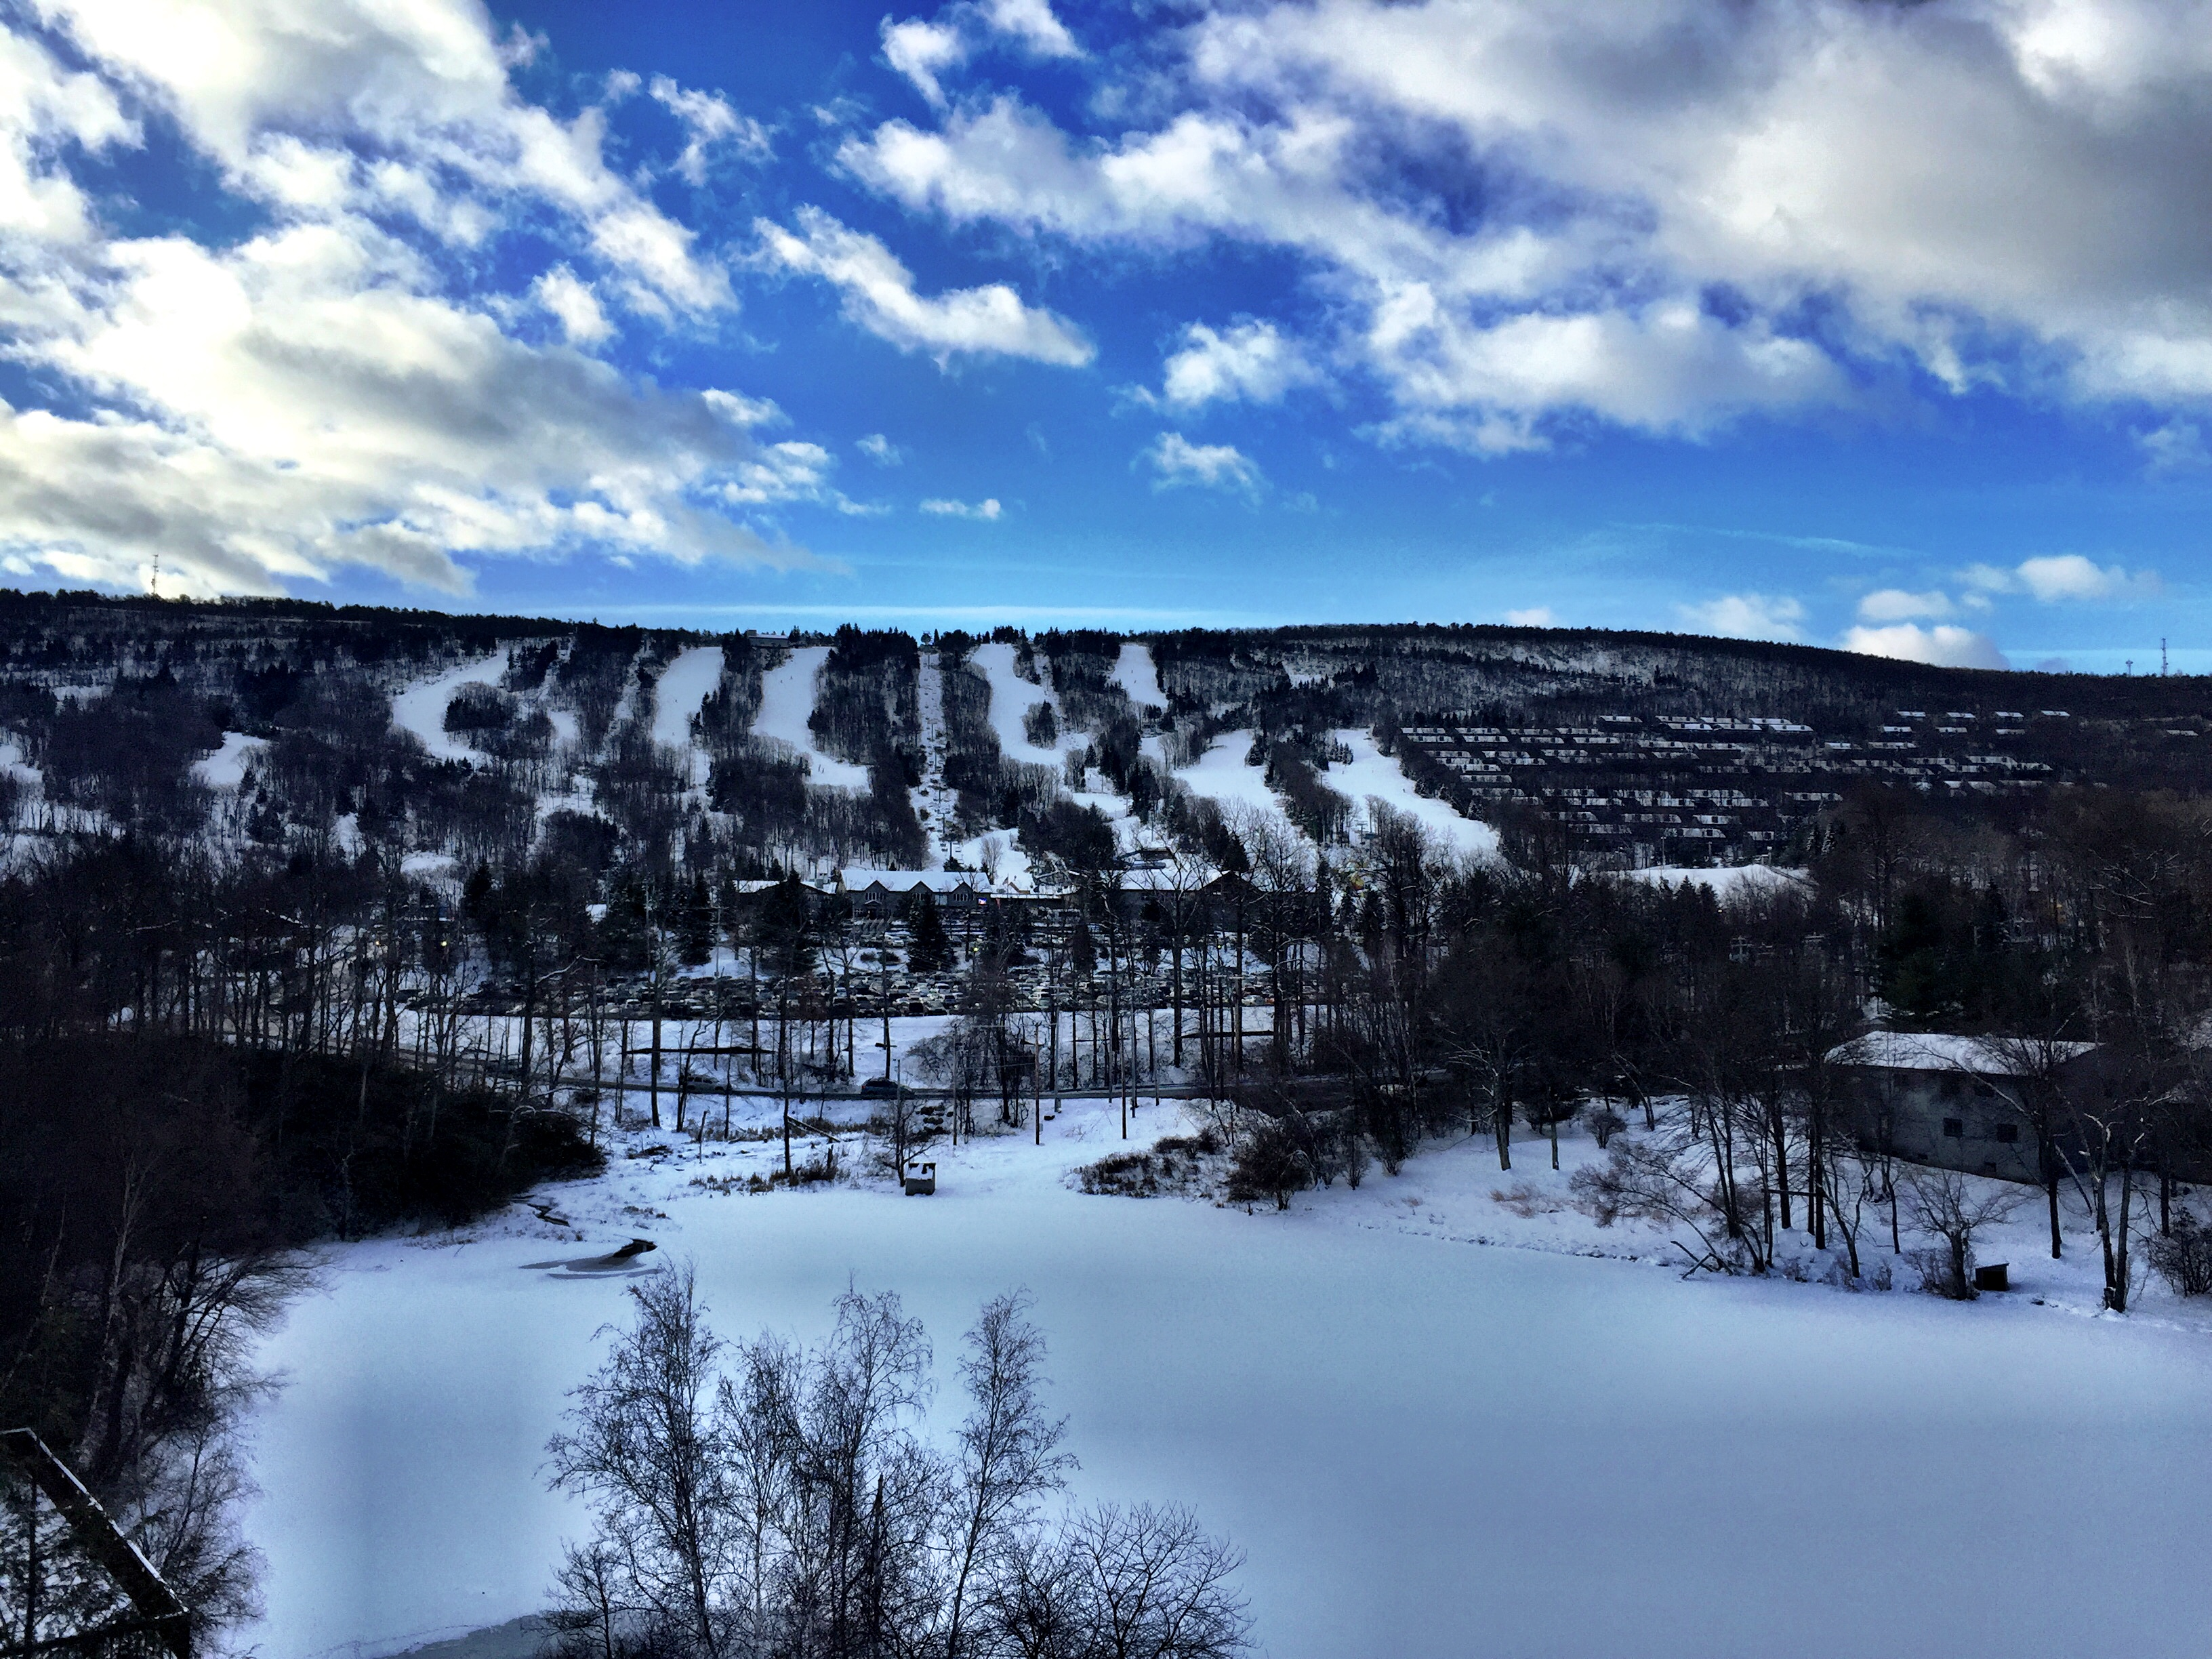 5 Family Fun Reasons to Visit Camelback Mountain Beyond Skiing